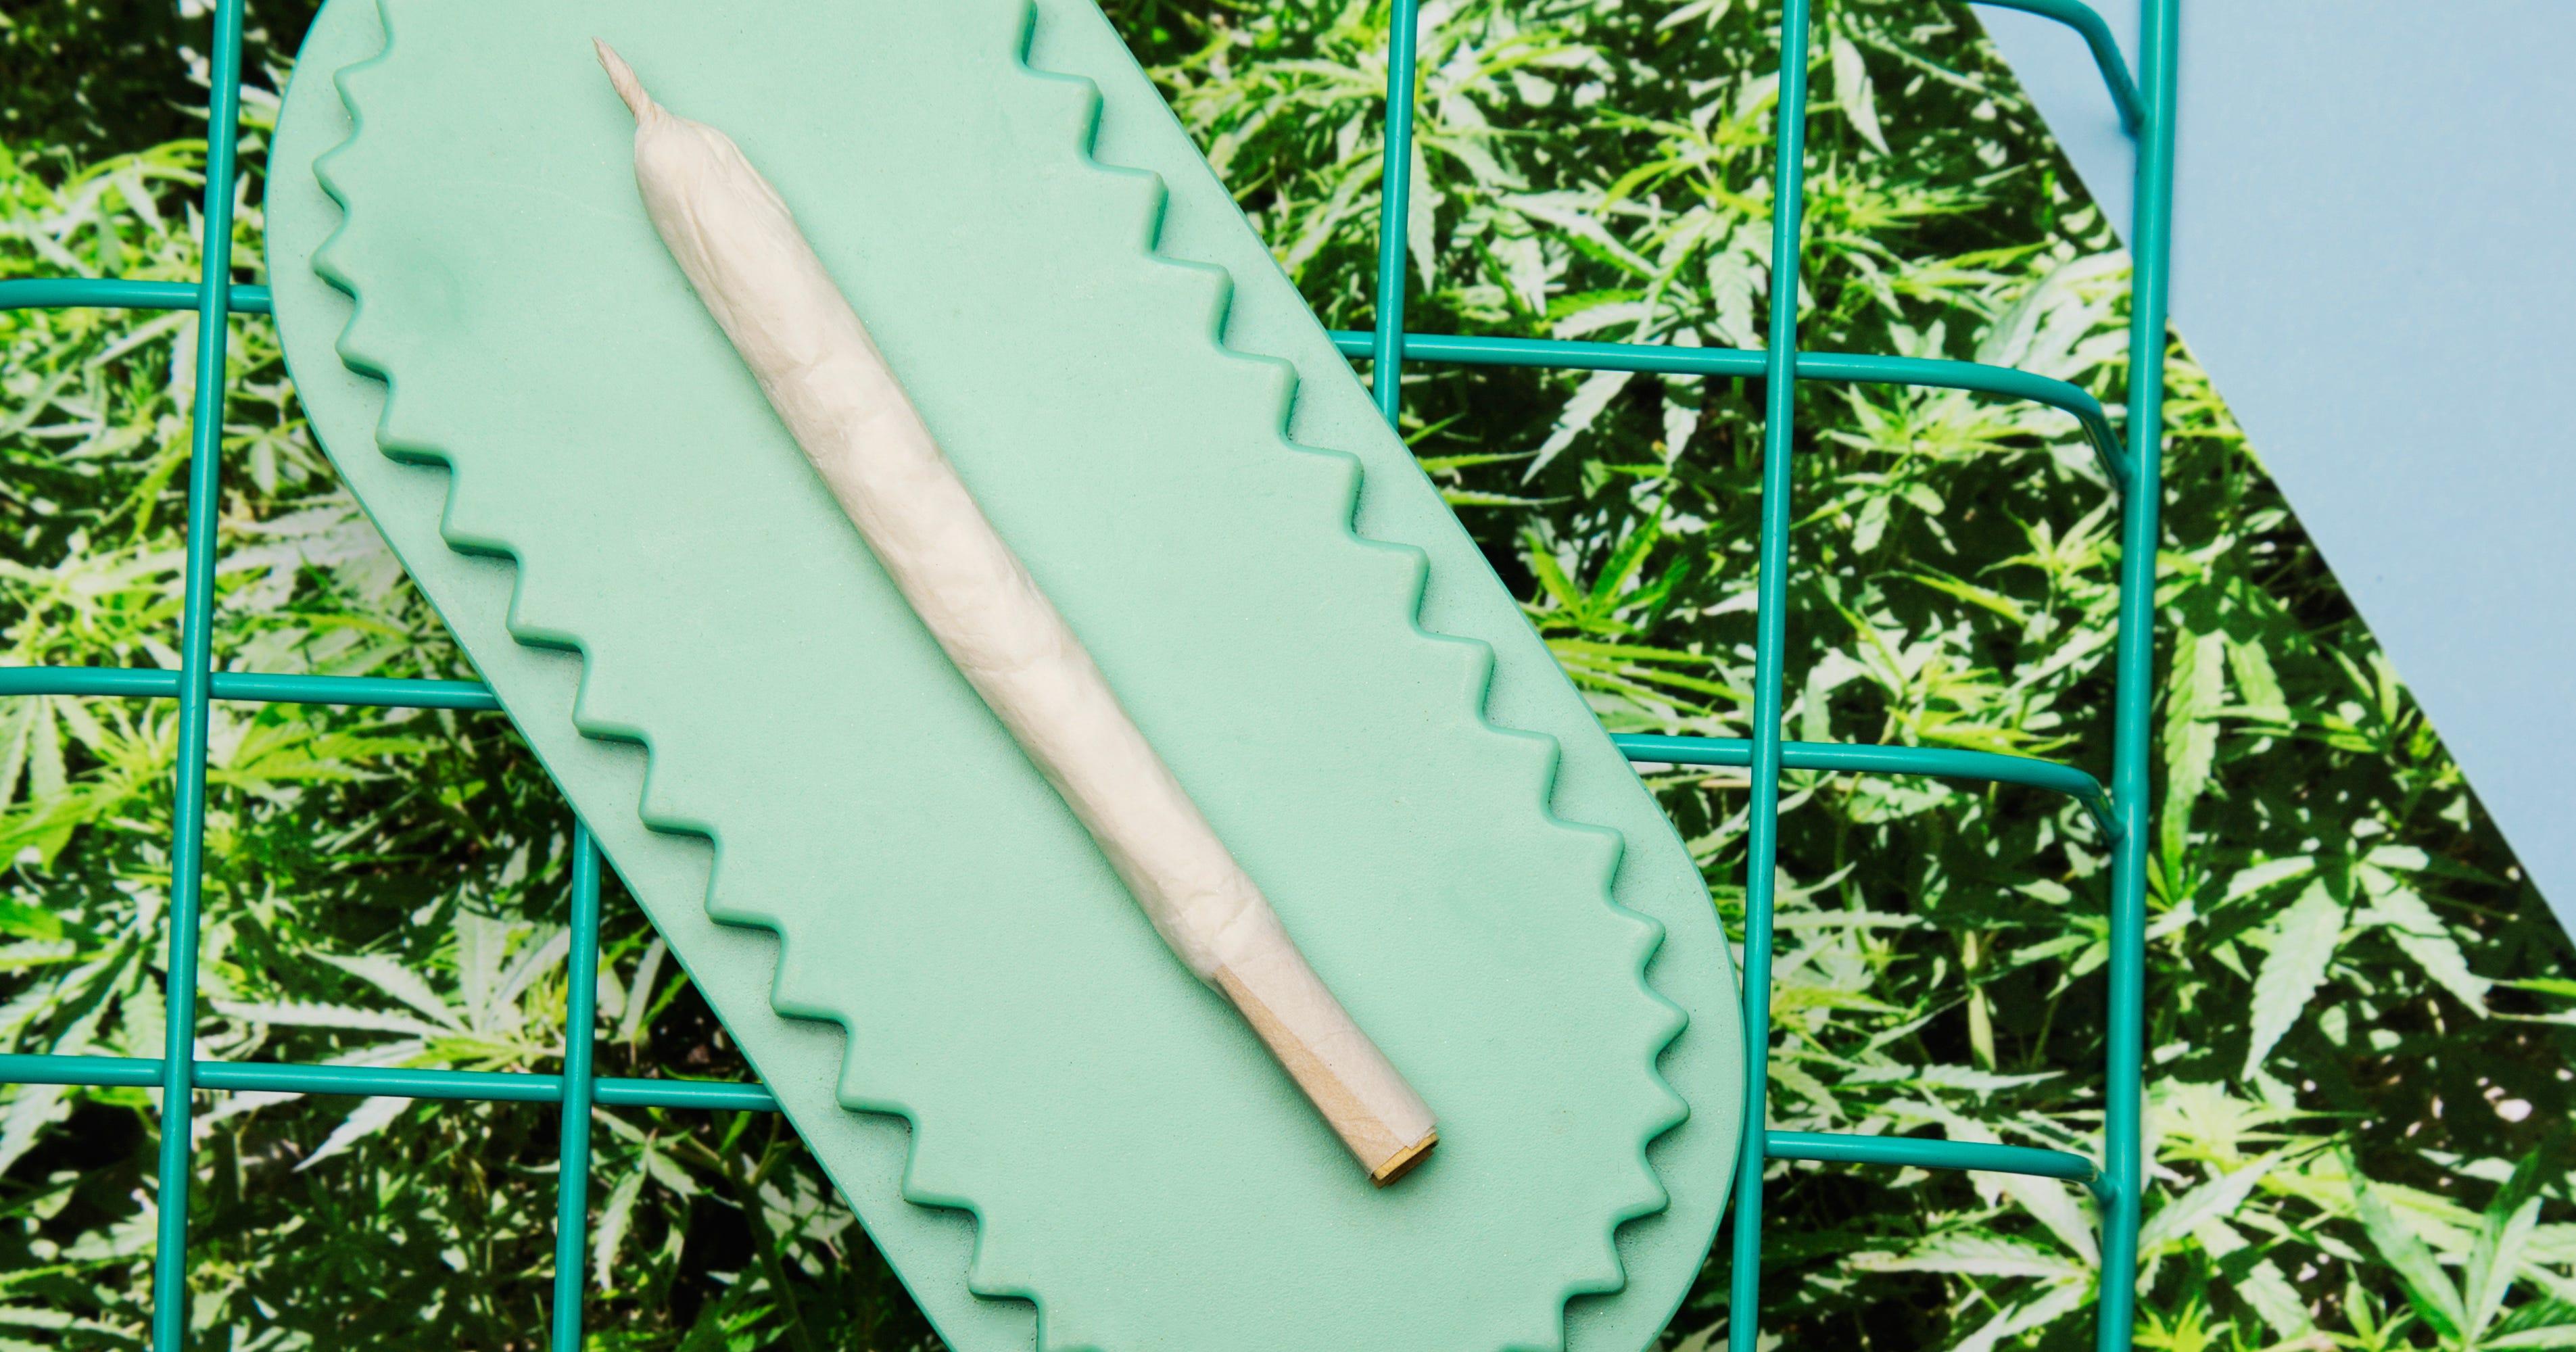 Weed Strains - Marijuana For Pain, Depression, Insomnia